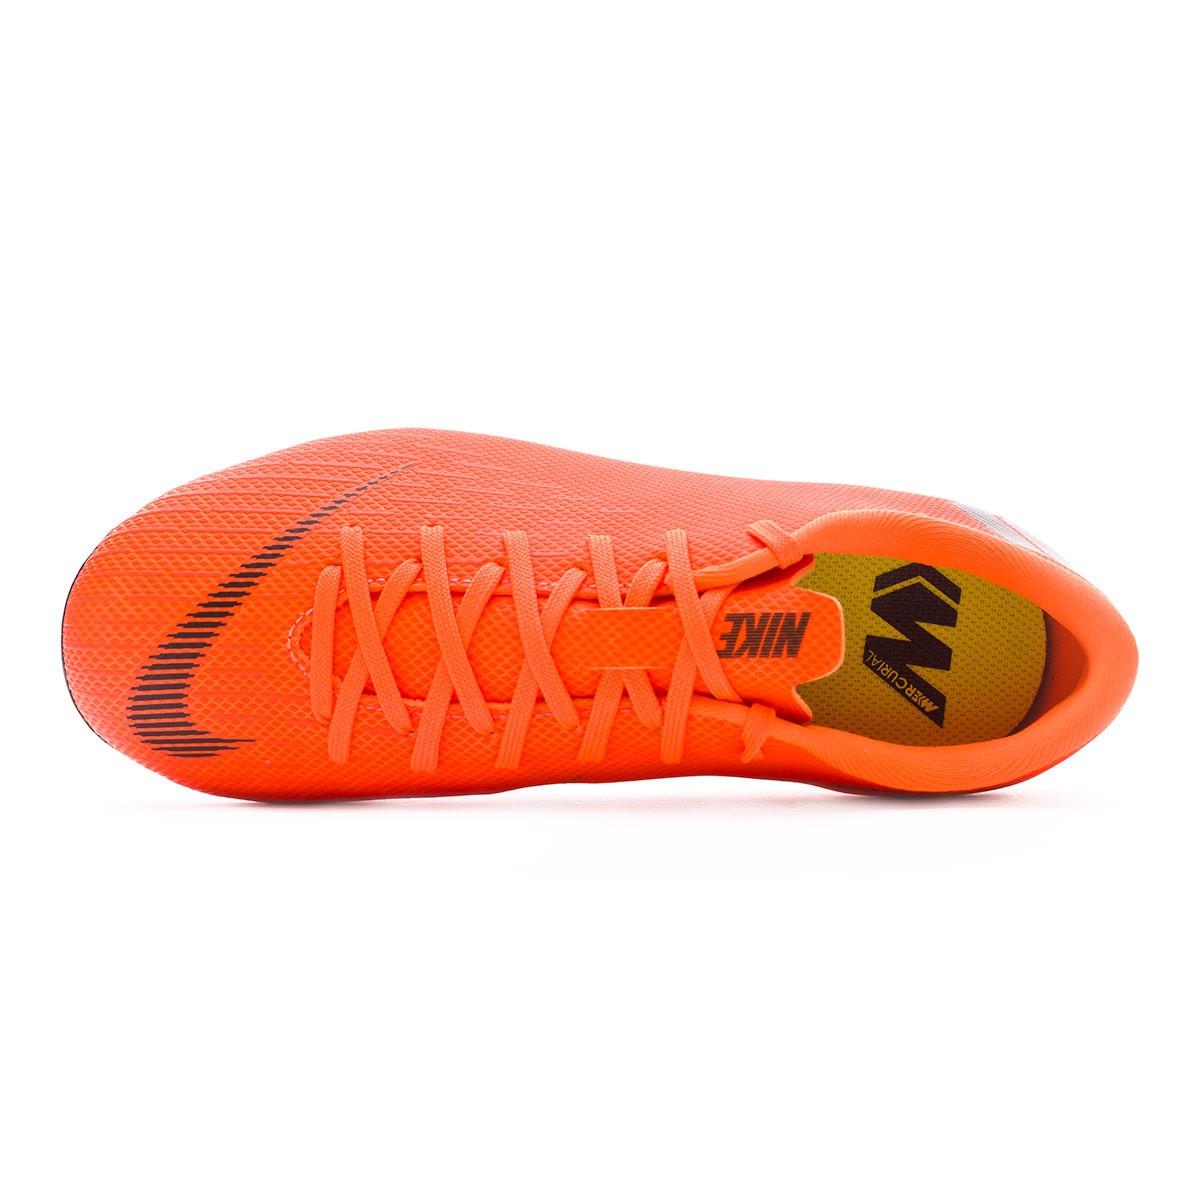 f1d133bee74 Football Boots Nike Kids Mercurial Vapor XII Academy GS MG Total orange- Black-Volt - Tienda de fútbol Fútbol Emotion